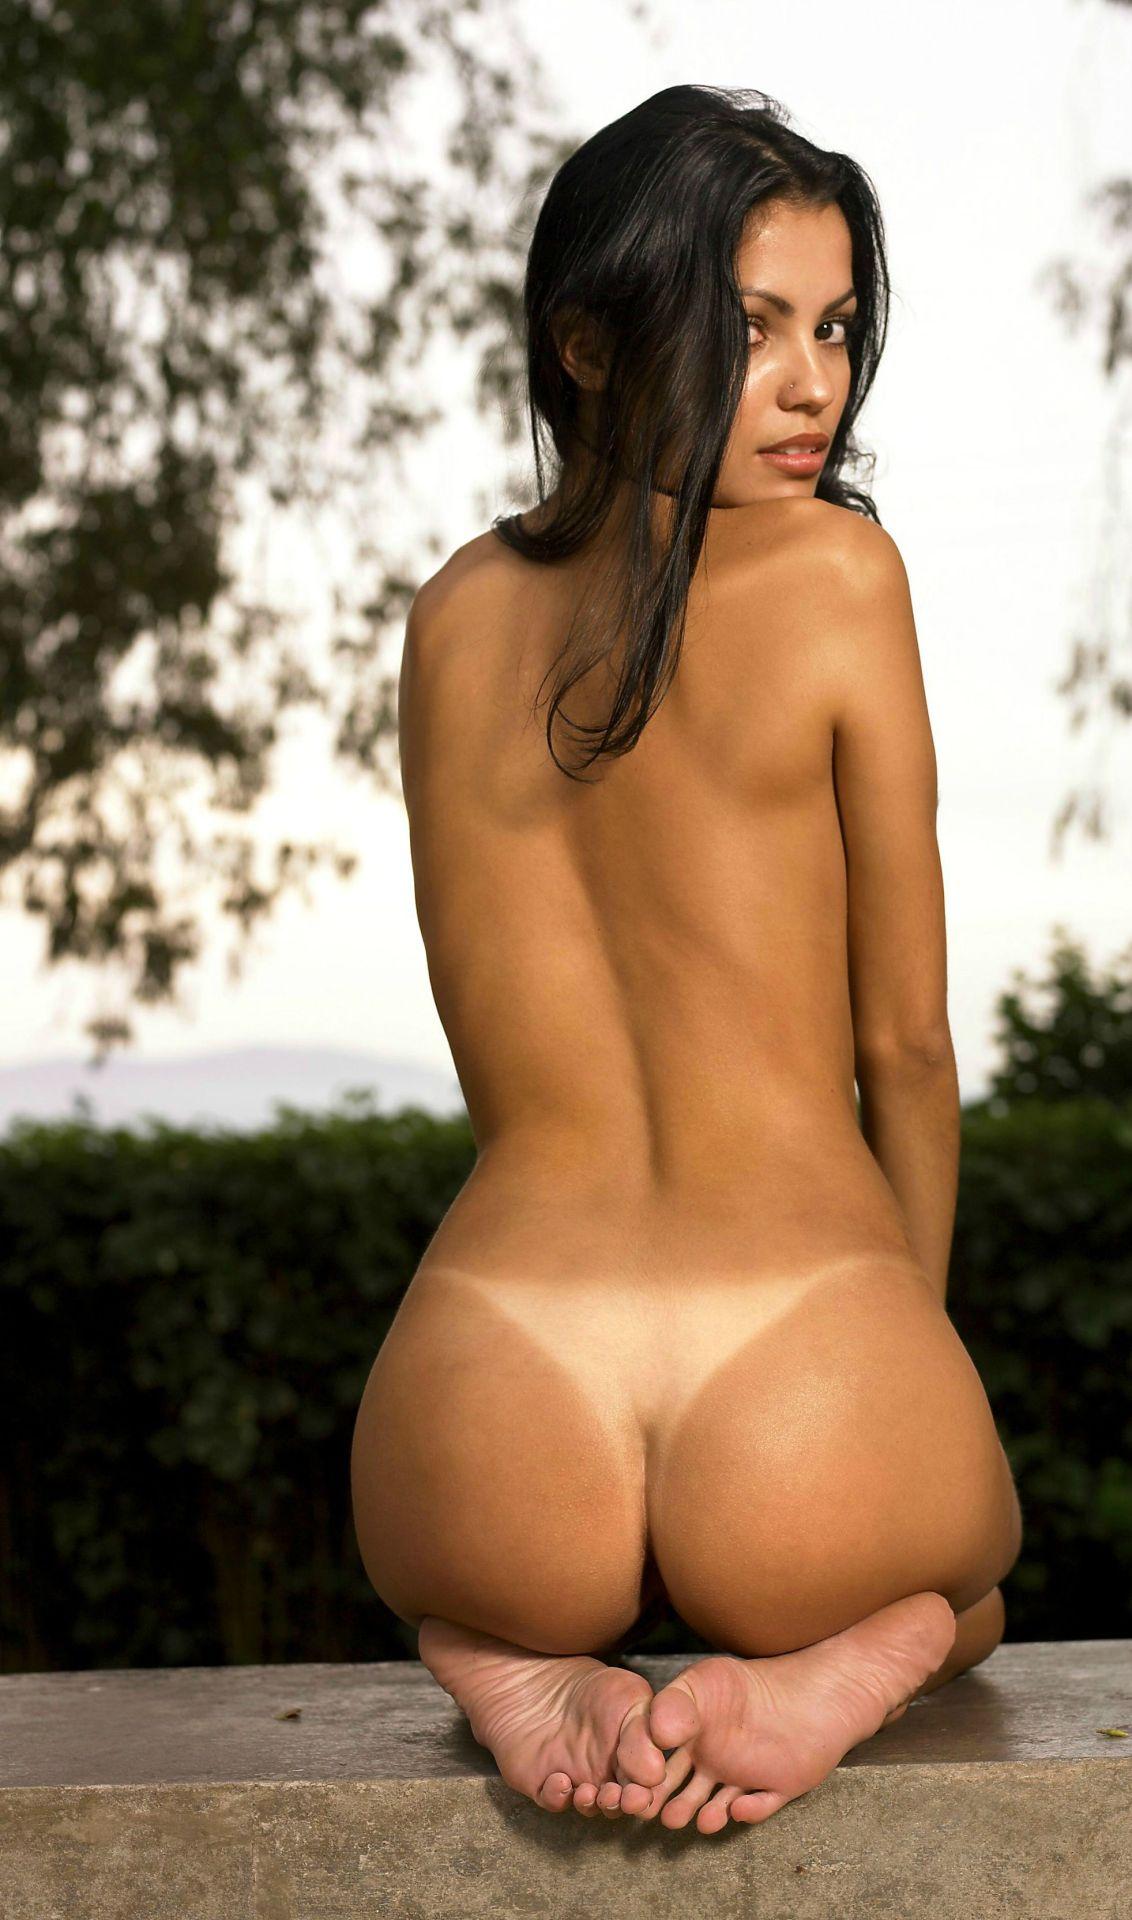 Milana Vayntrub Nude Fakes